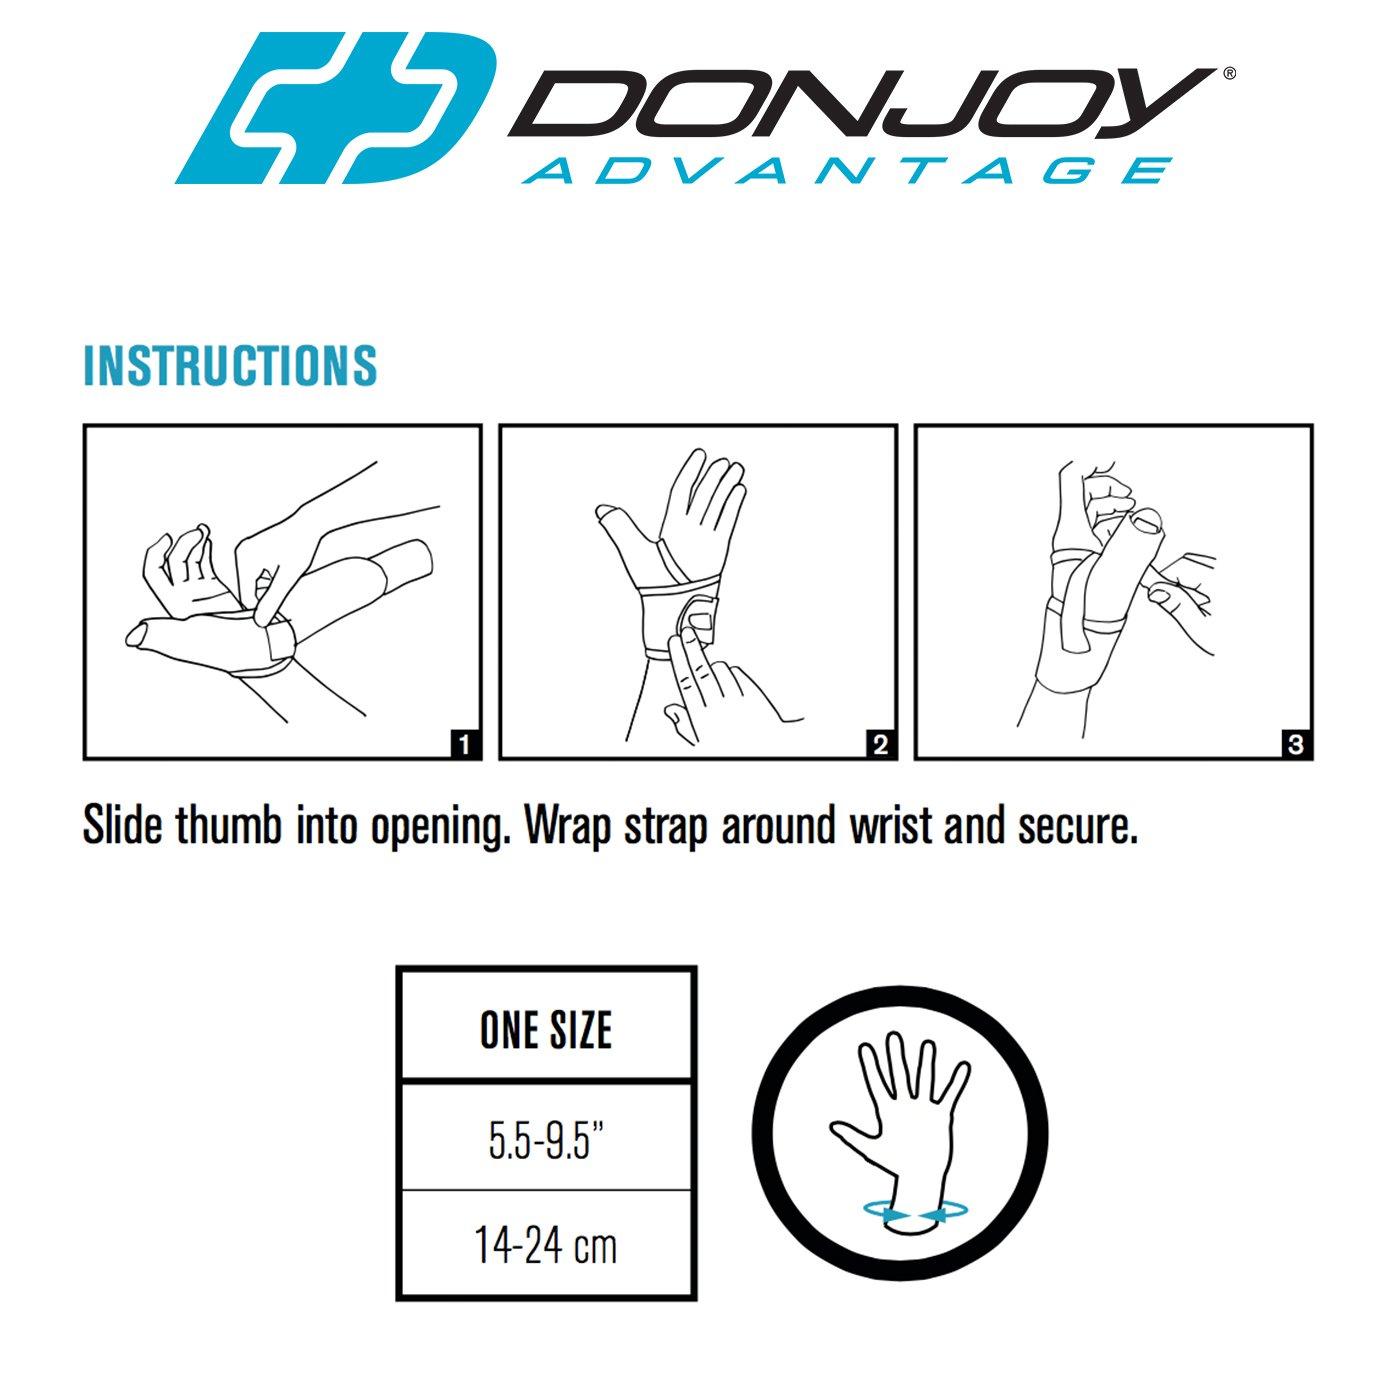 DonJoy Advantage DA161TB01-BLK Wrap Around Stabilizing Thumb Splint, Black, Adjustable, Fits 5.5'' to 9.5'', Best for Tendonitis, Arthritis, Instability by DonJoy Advantage (Image #3)